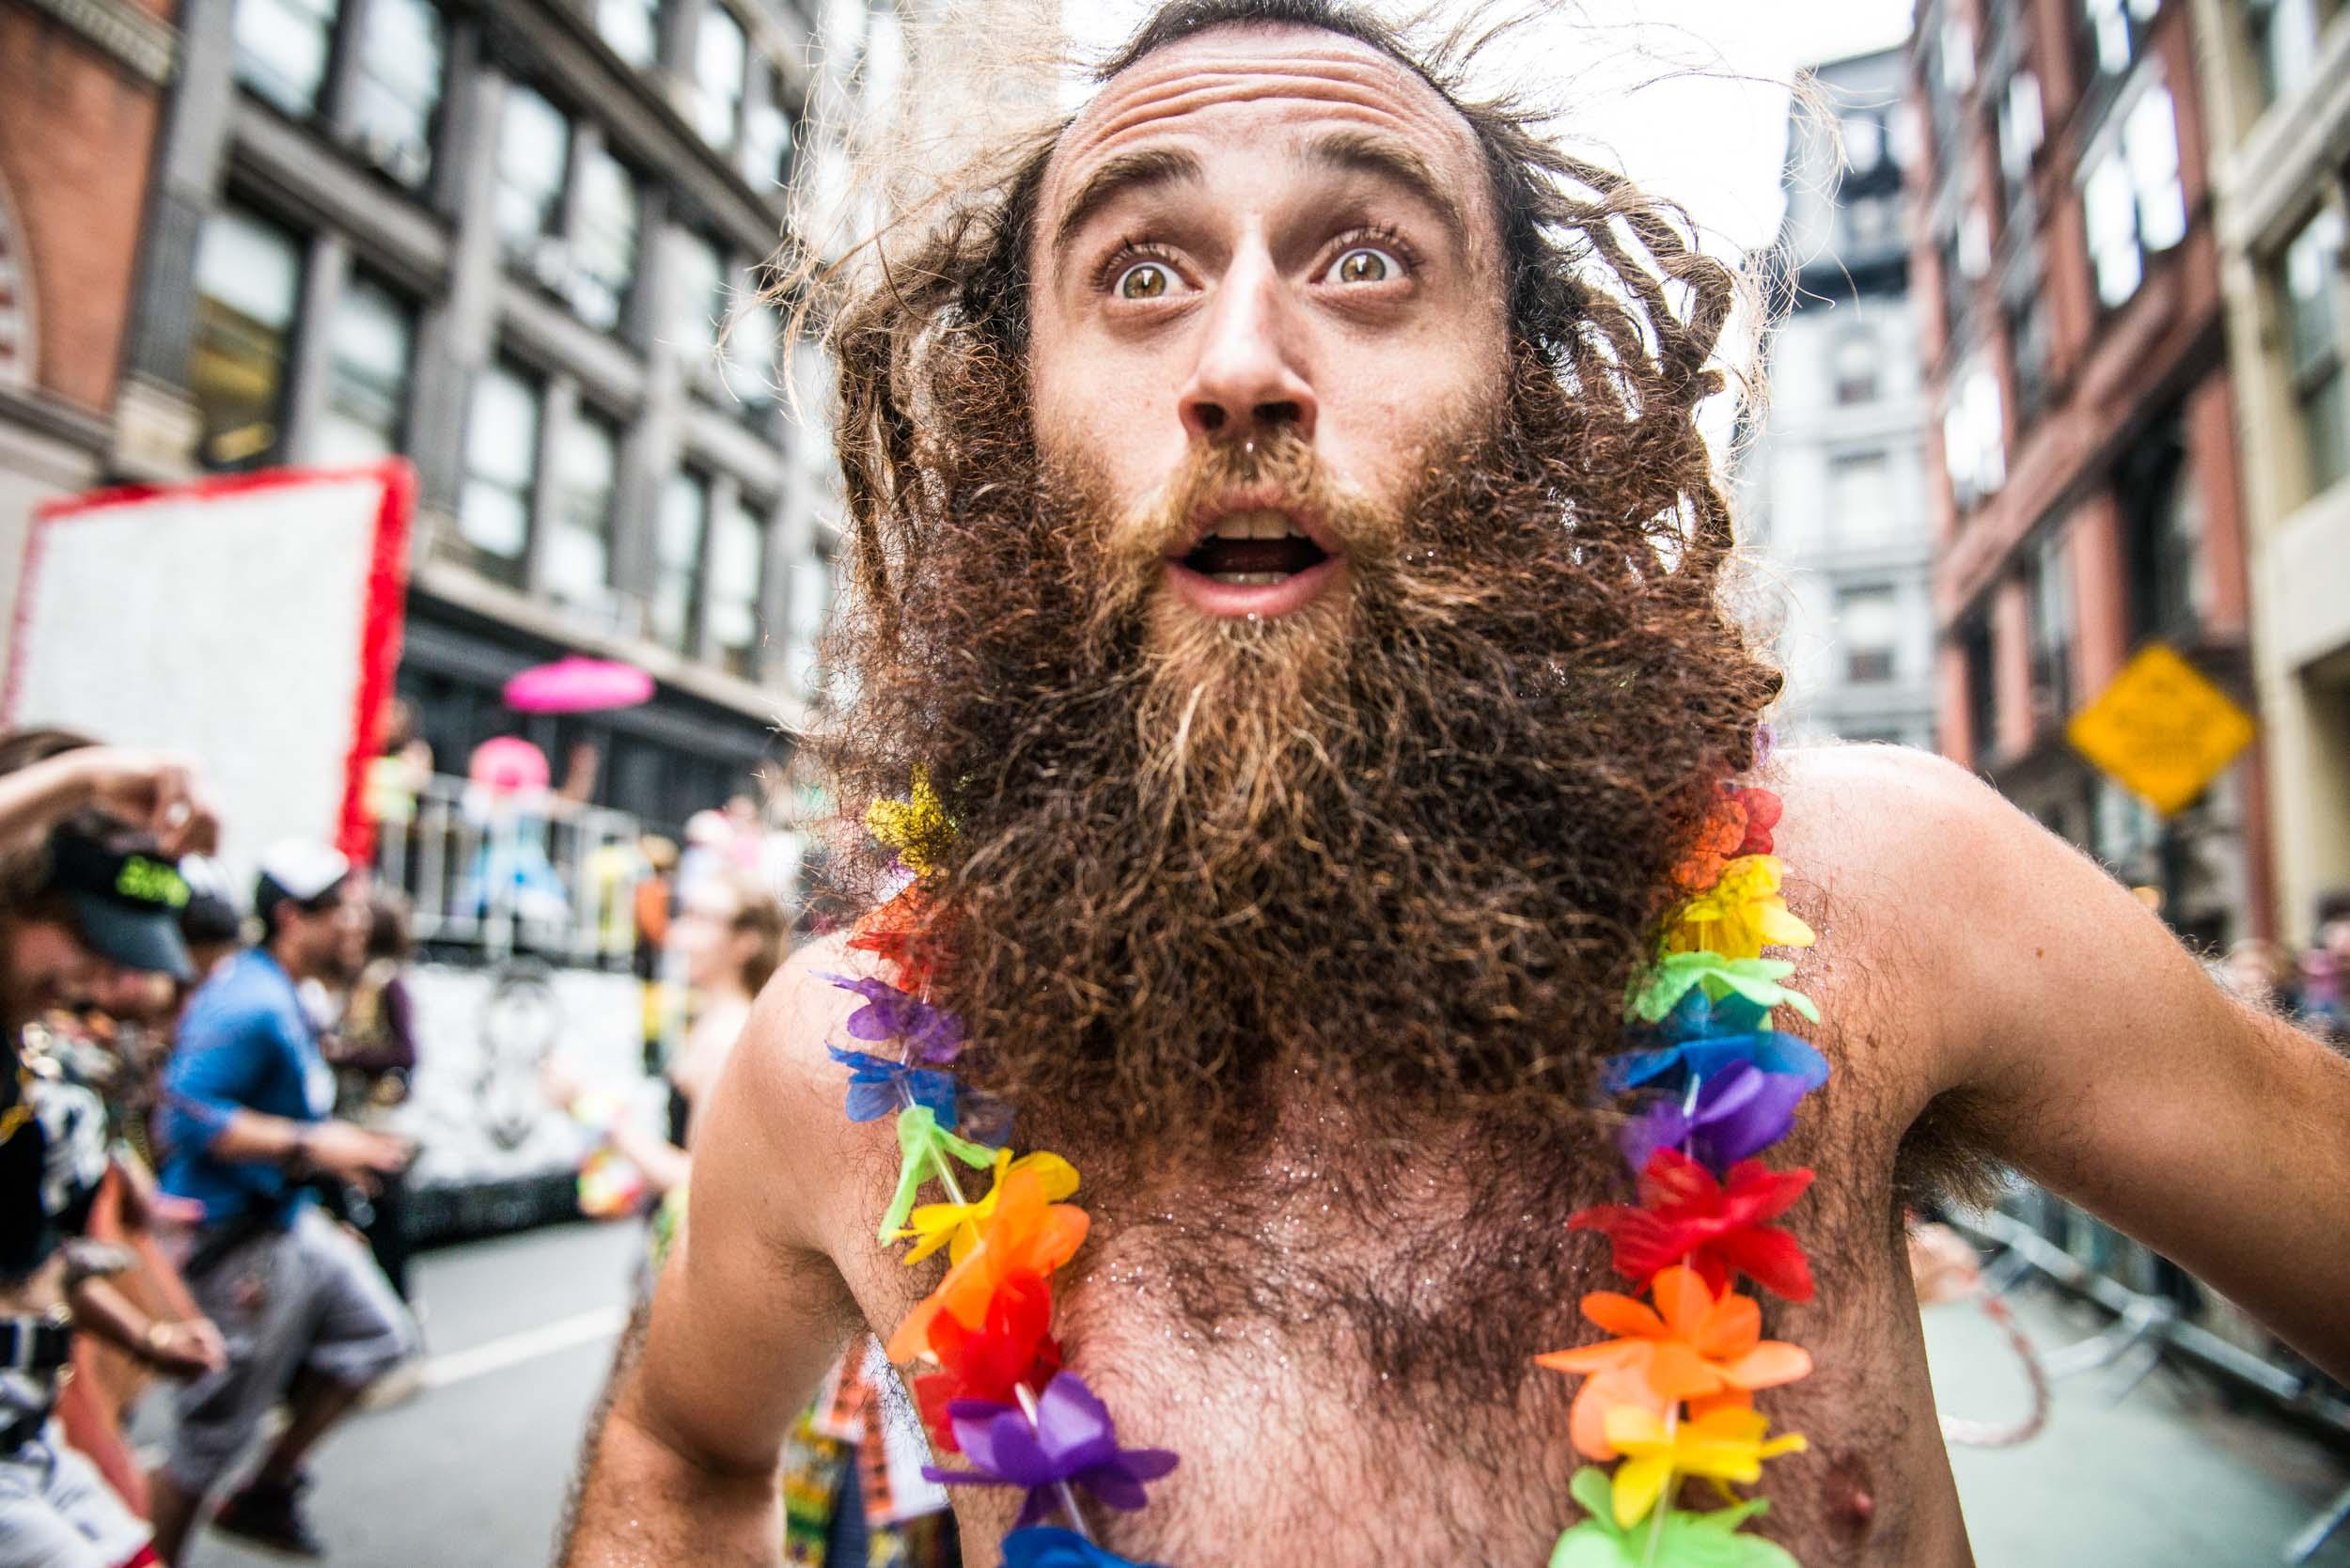 Man at street dance festival - Current events - Photo credit Nicola Bailey.jpg